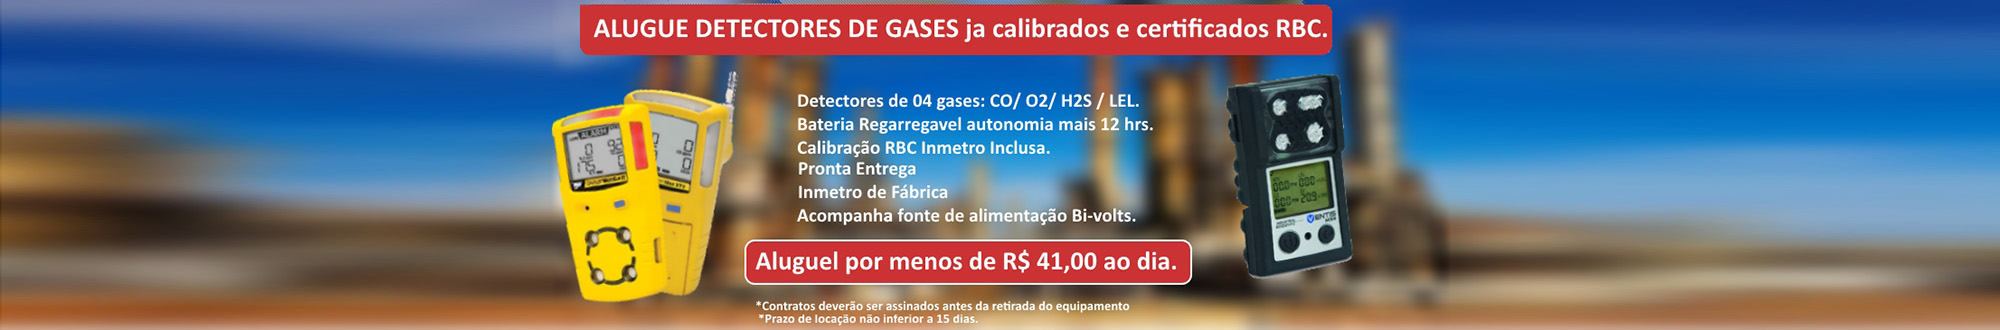 Locacao-detectores-de-gases-bw-offshore-percon-tecnologia-melhor